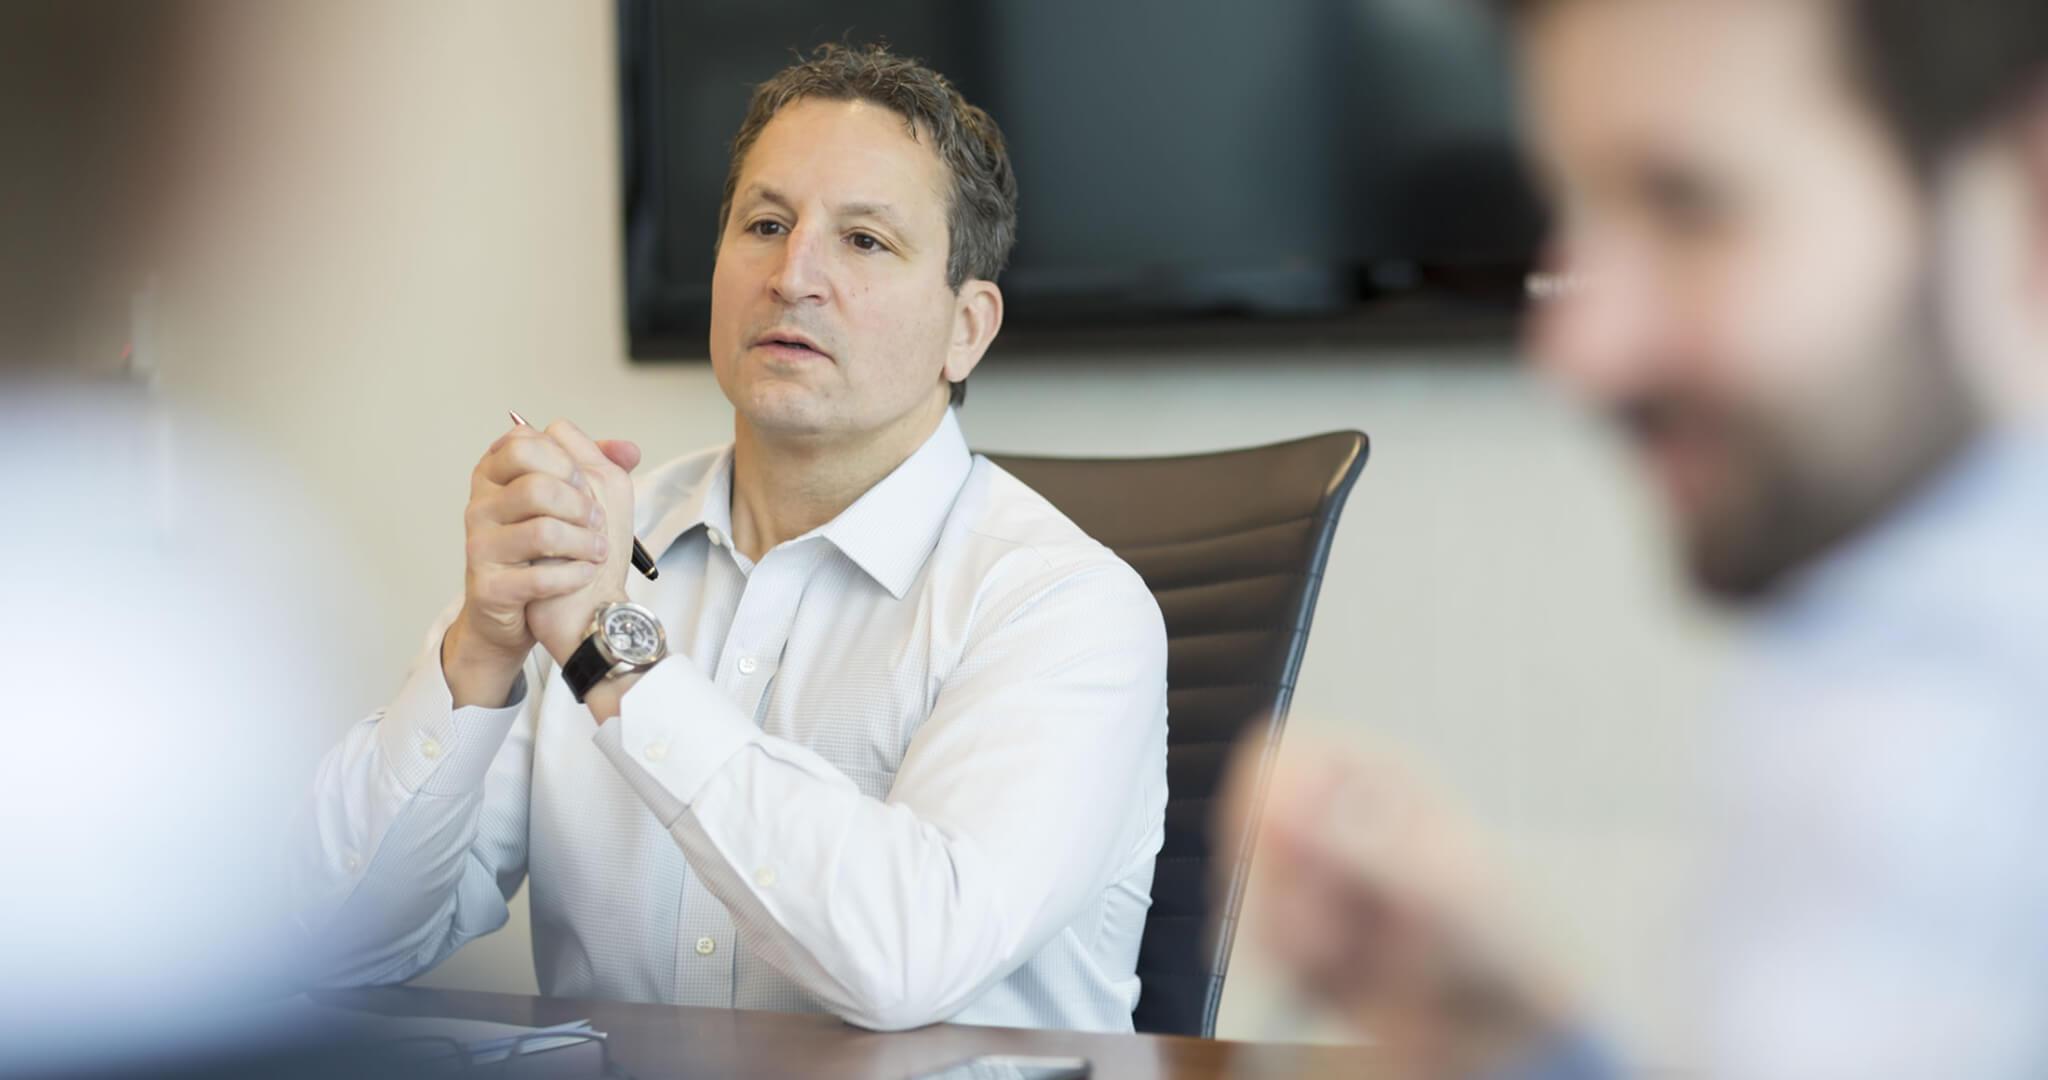 David Herro in a meeting